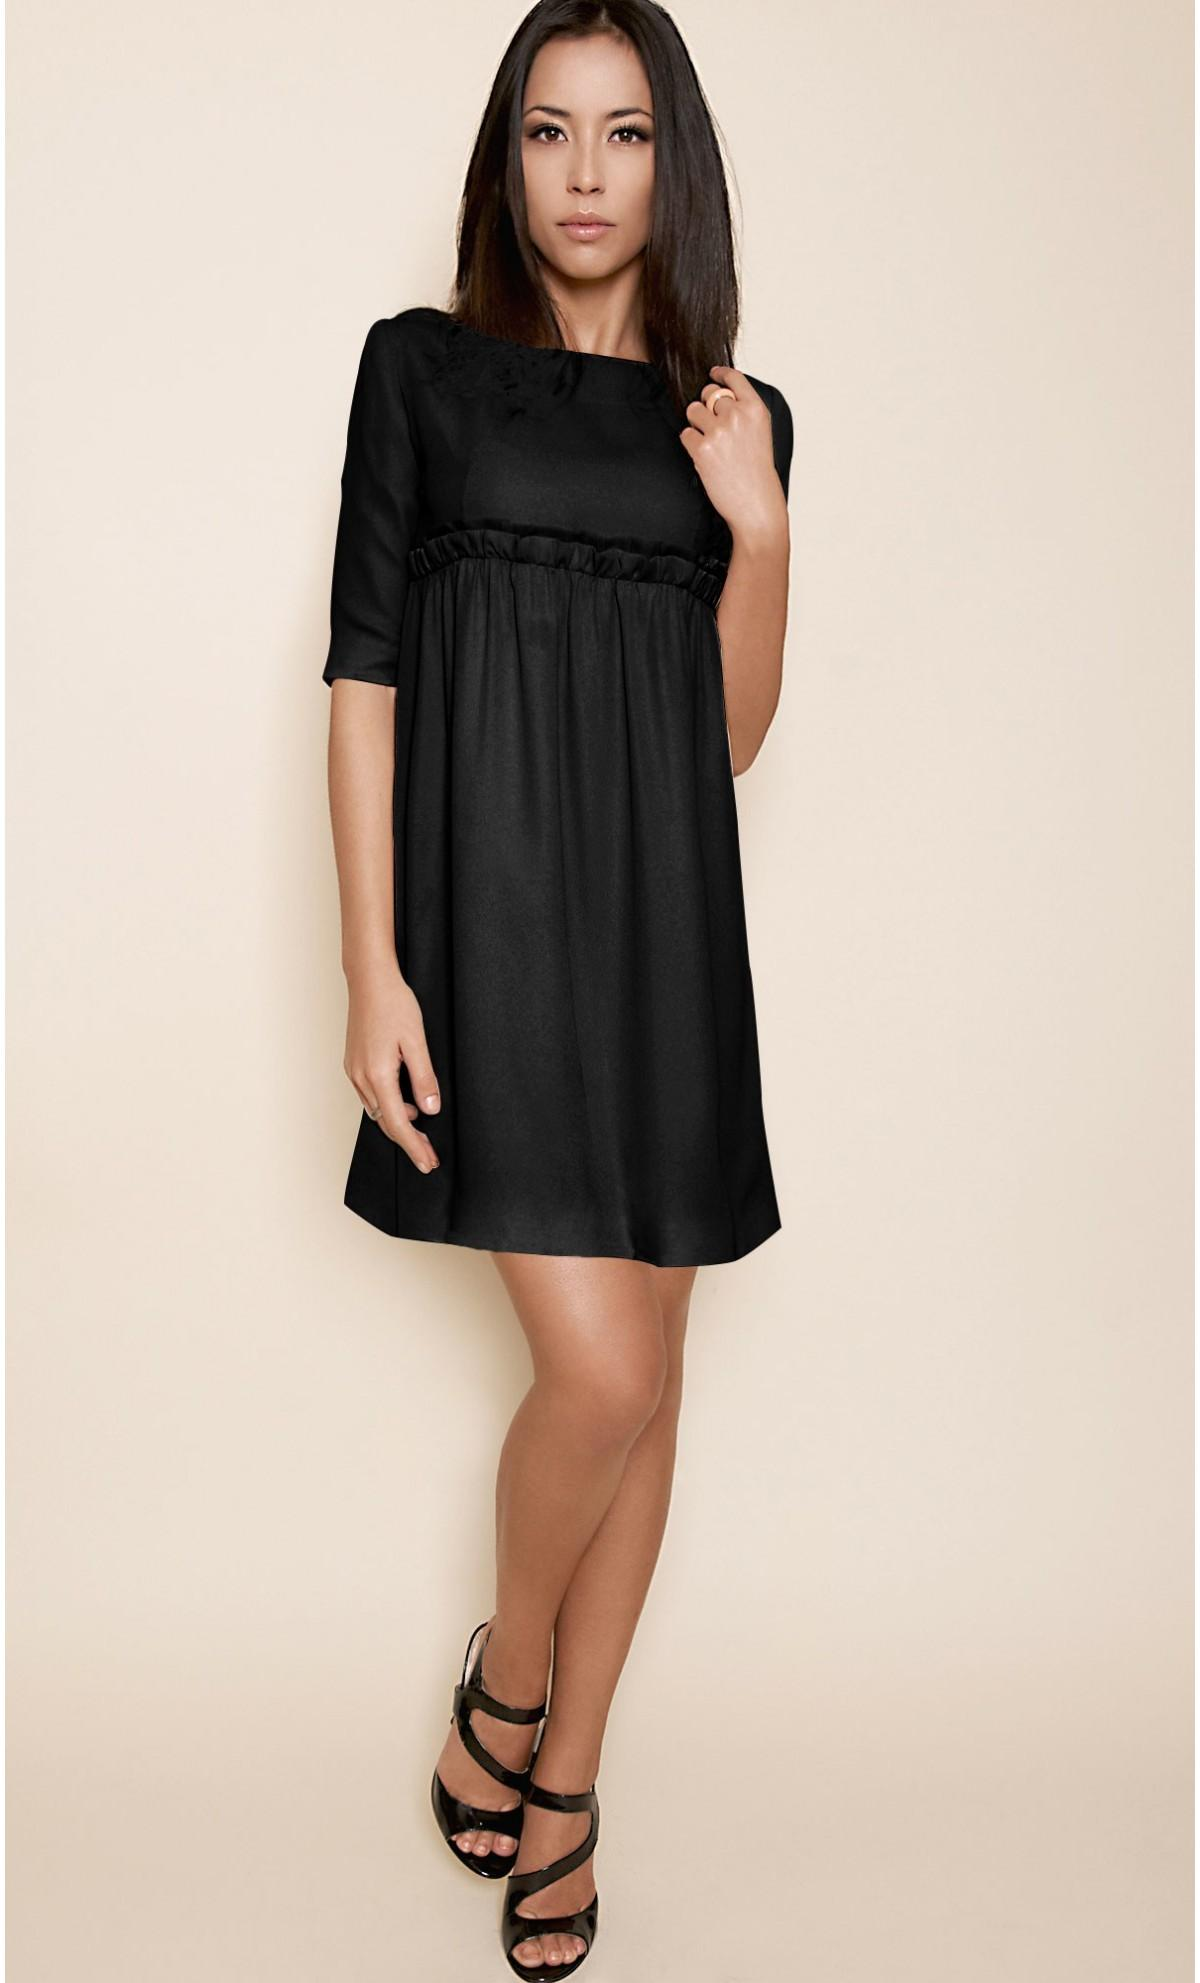 Robe noir droite courte